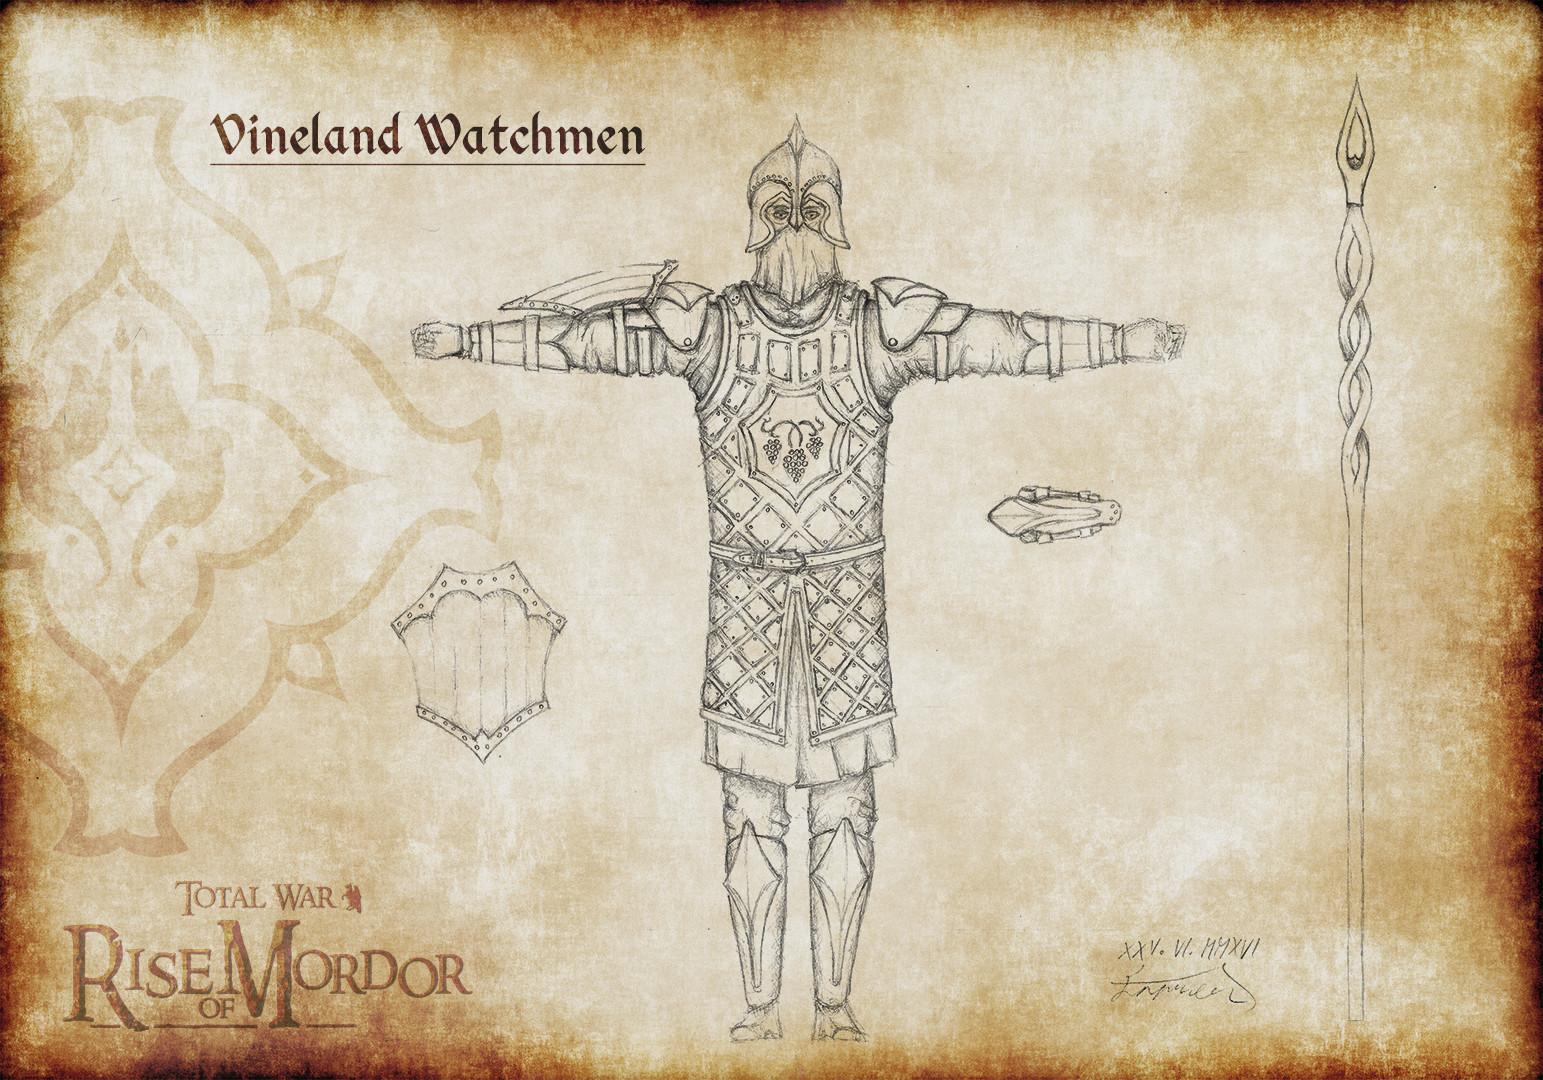 Adam dotlacil concept vineland watchmen